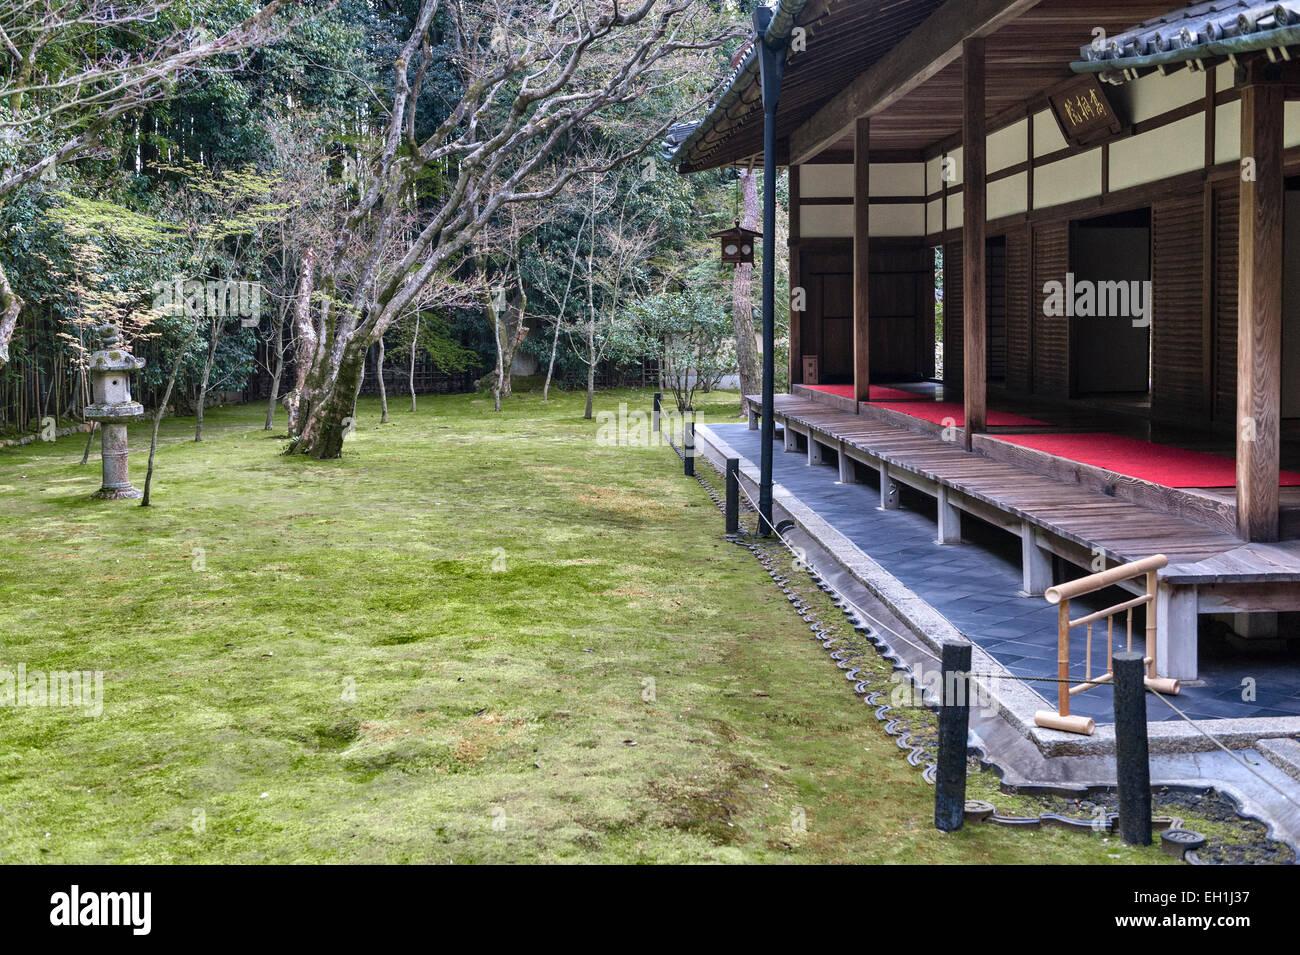 Koto-in Zen Buddhist temple, Daitoku-ji, Kyoto, Japan. - Stock Image